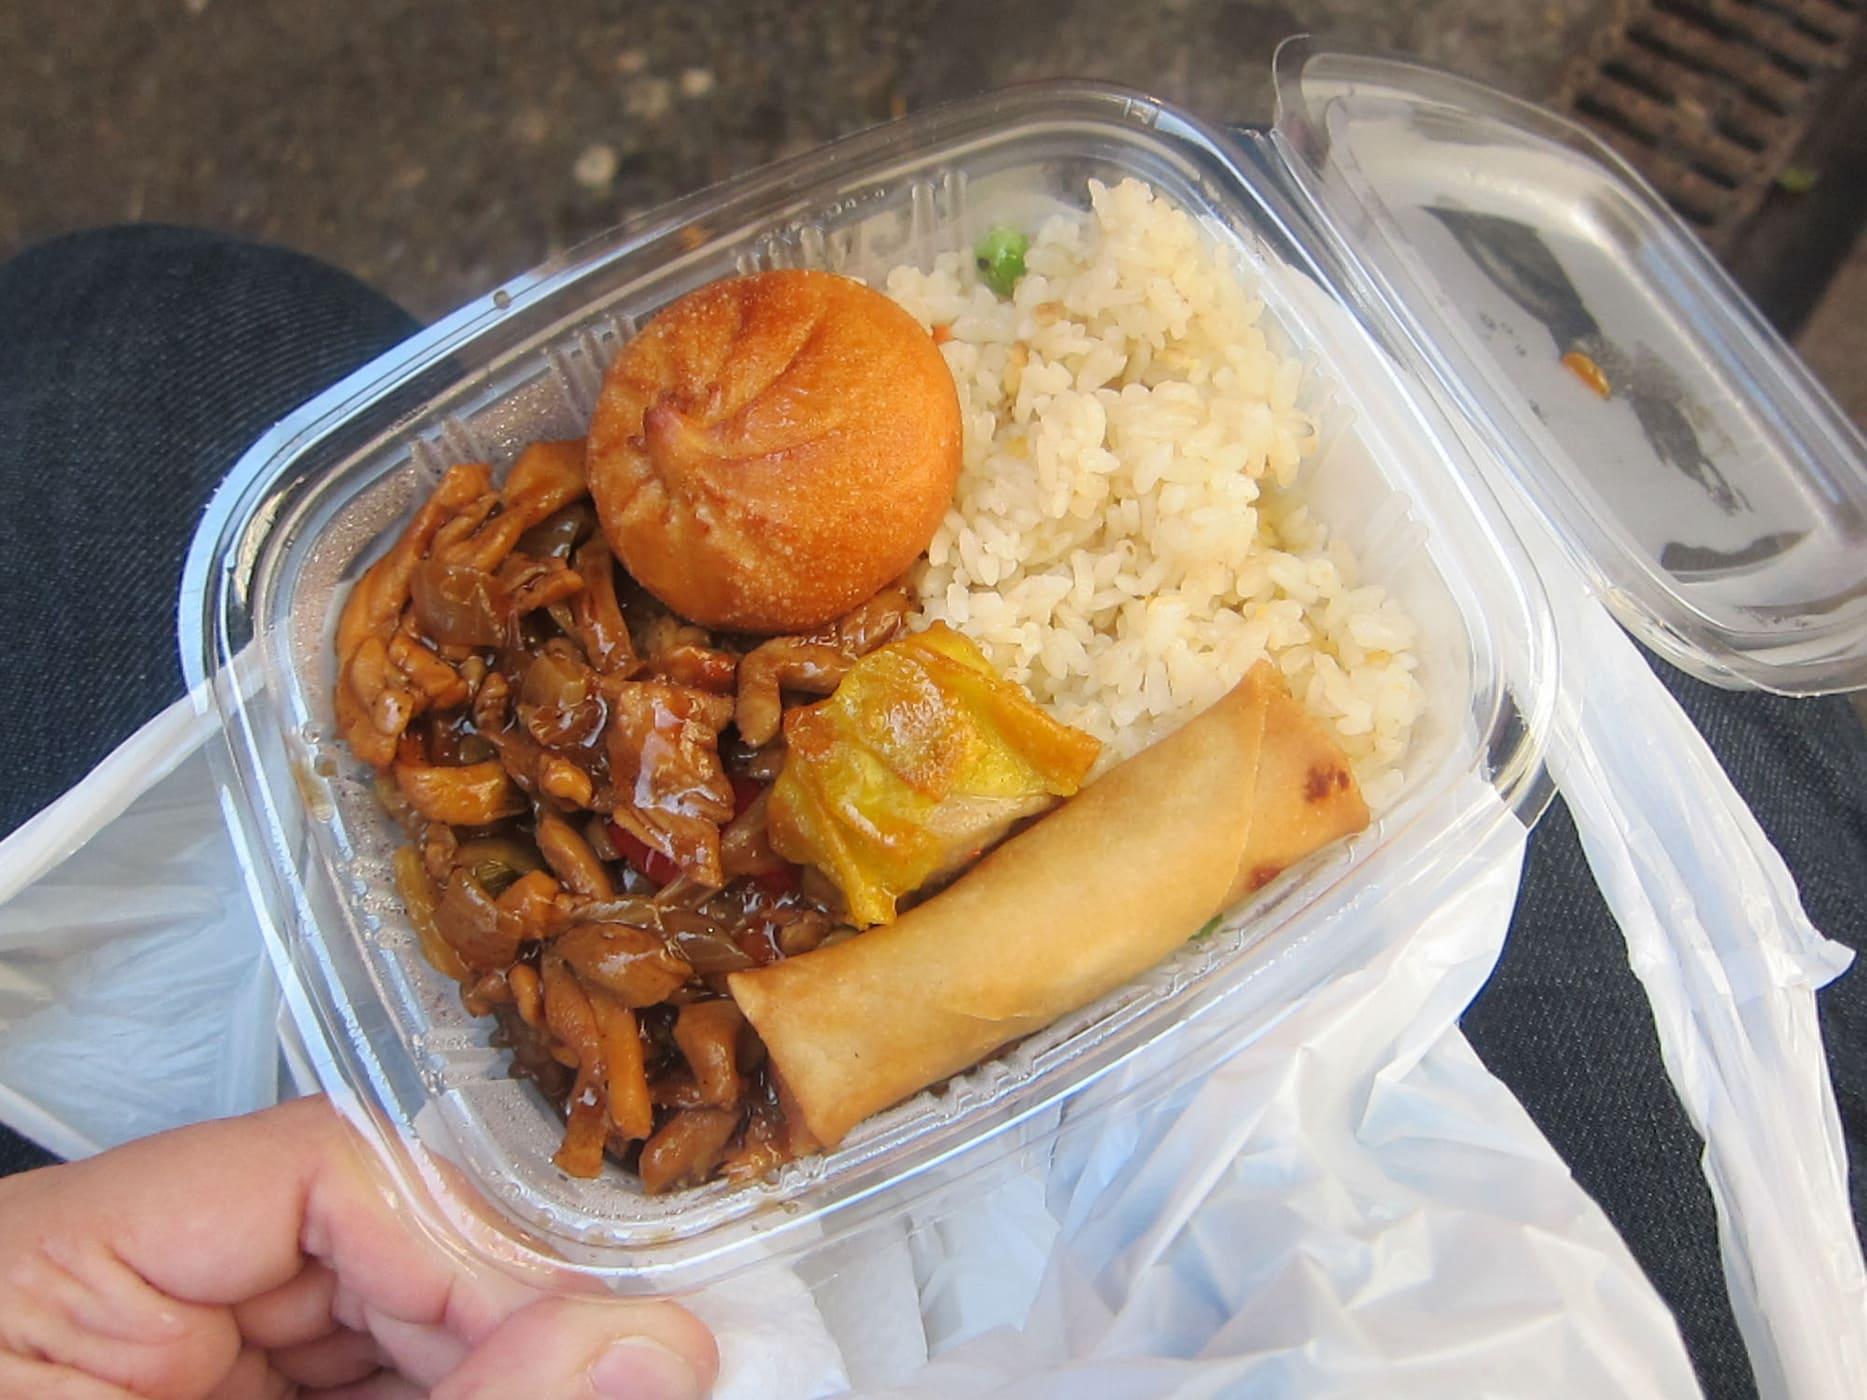 Chinese food from Mercat de Sant Josep de La Boqueria in Barcelona, Spain.